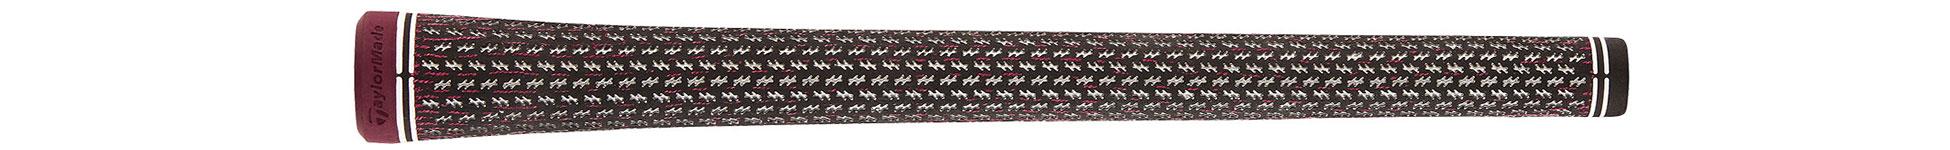 Lamkin Genesis Crossline Cord